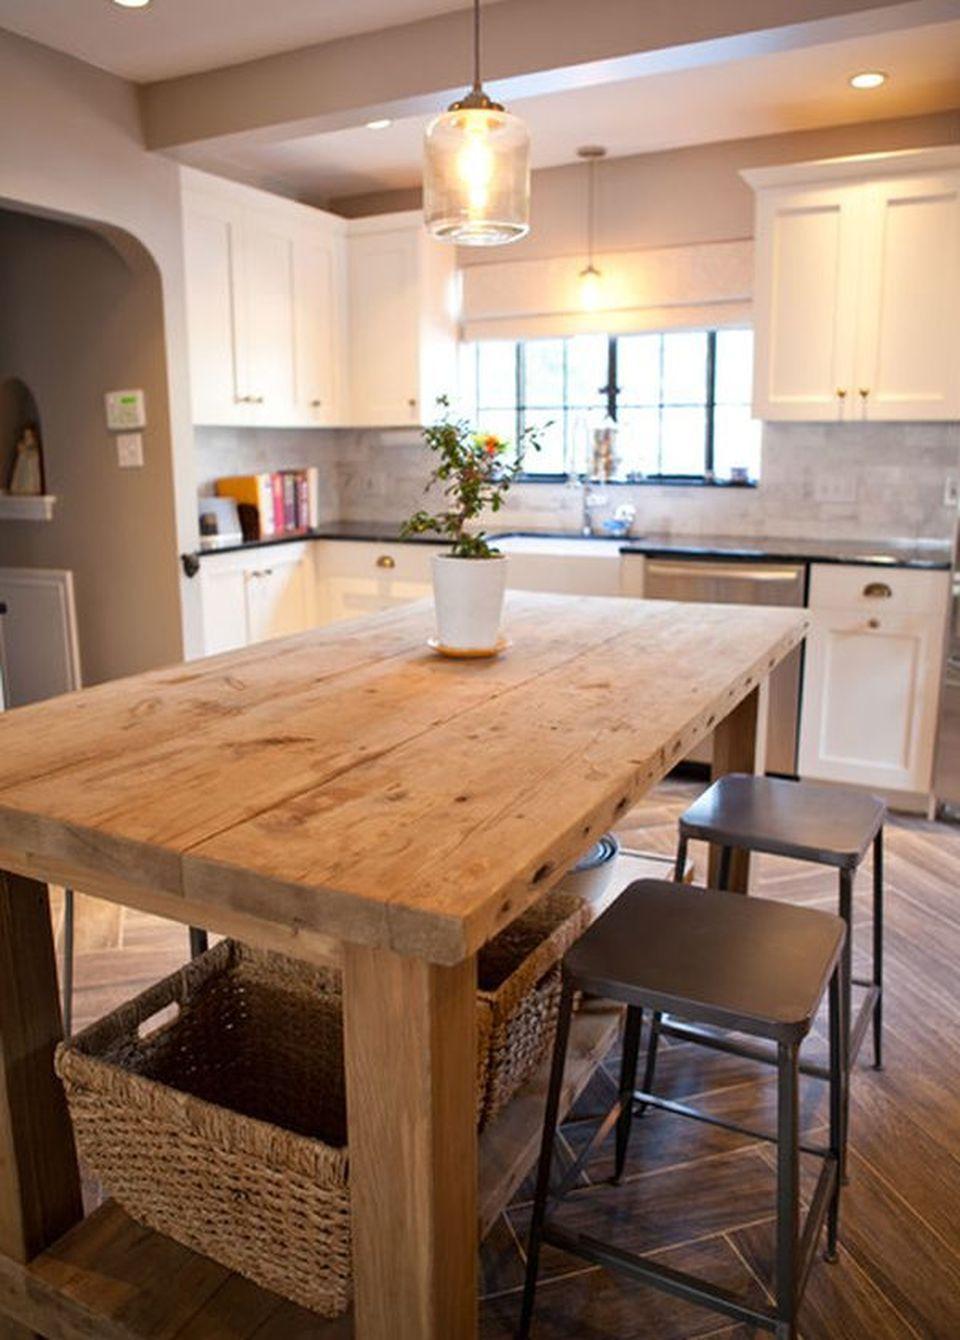 vintage farmhouse kitchen island inspirations 39 kitchen island with seating kitchen island on kitchen island ideas diy id=43336